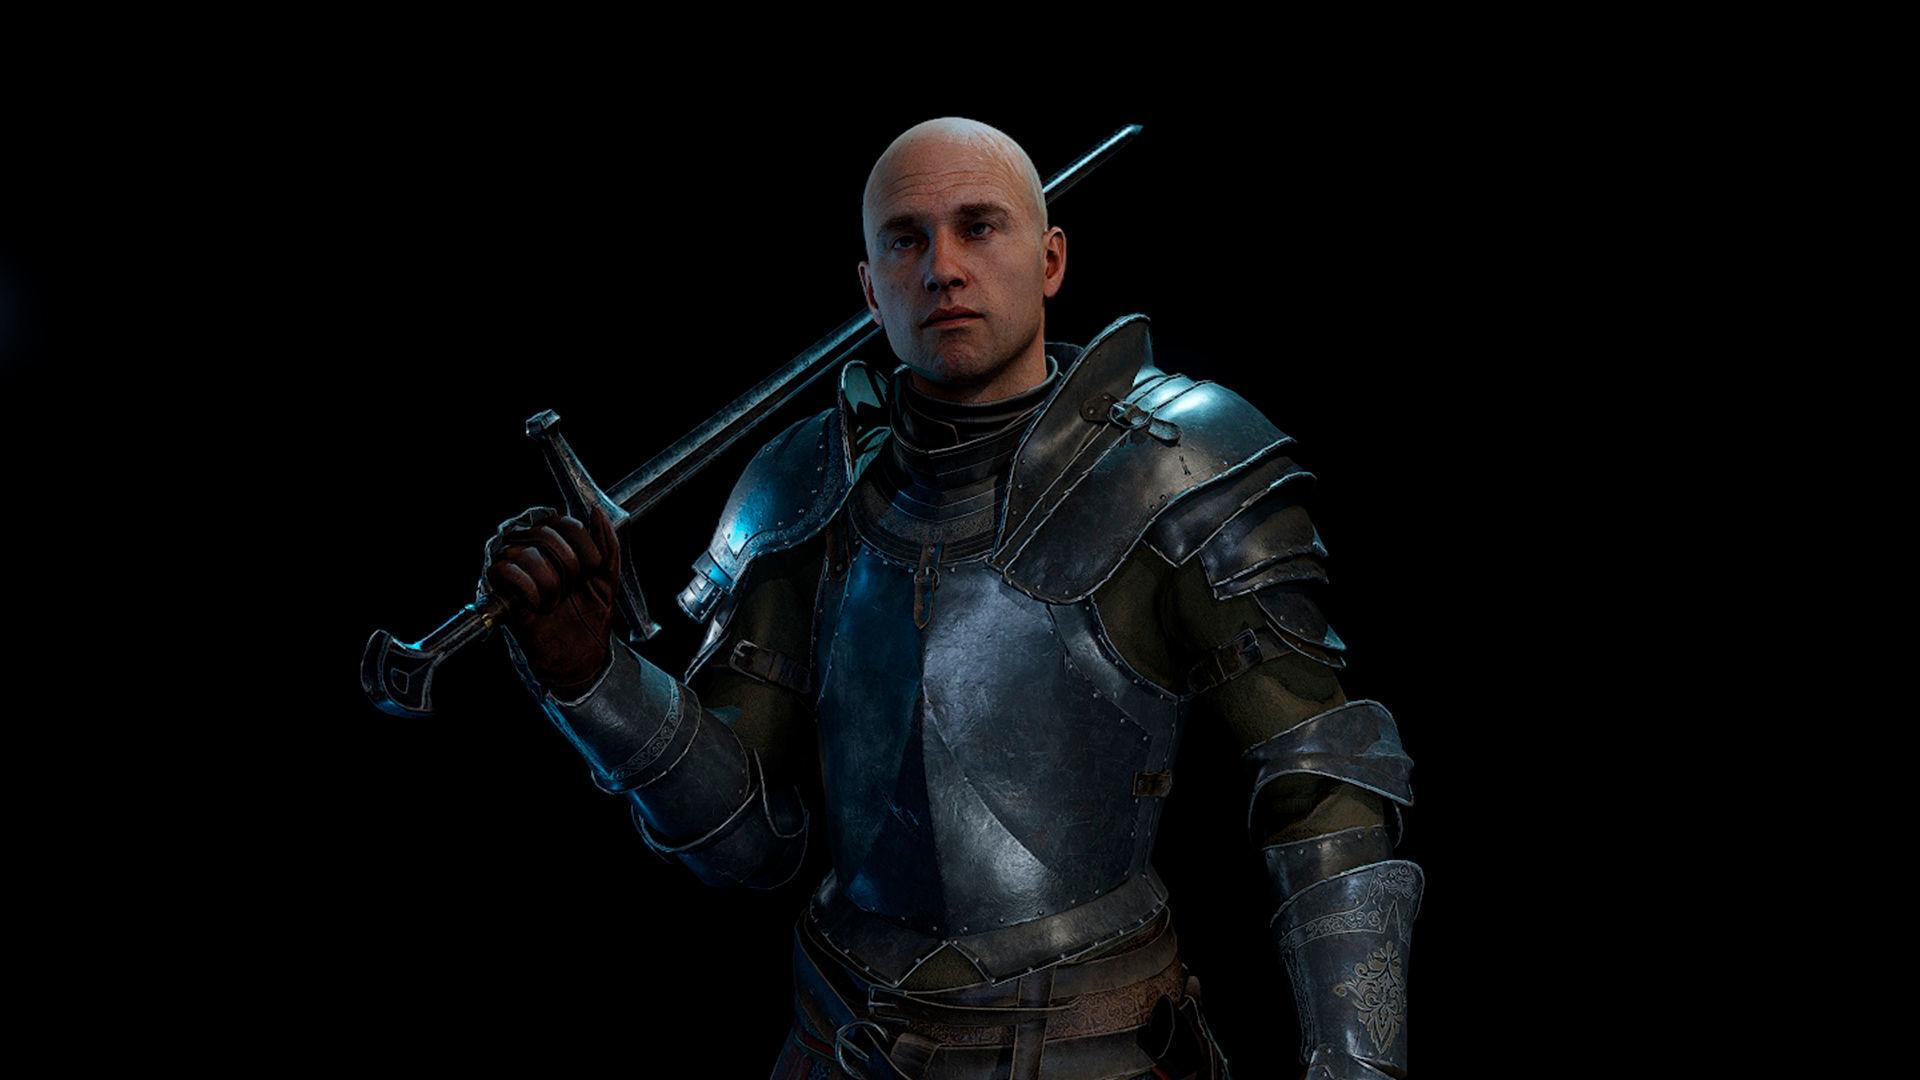 Knight Alex medieval